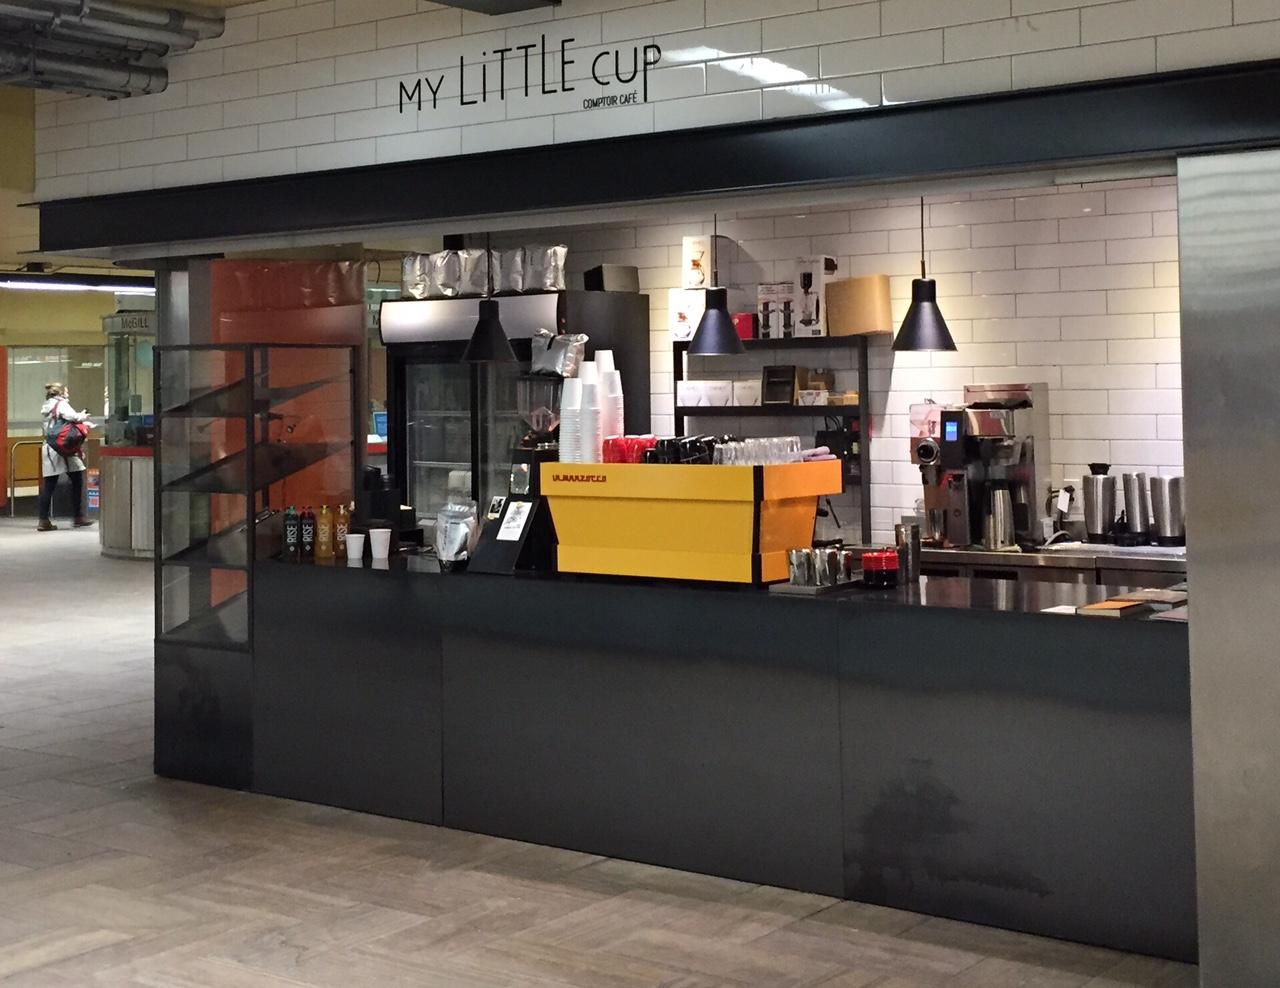 black blue steel cafe counters.jpg